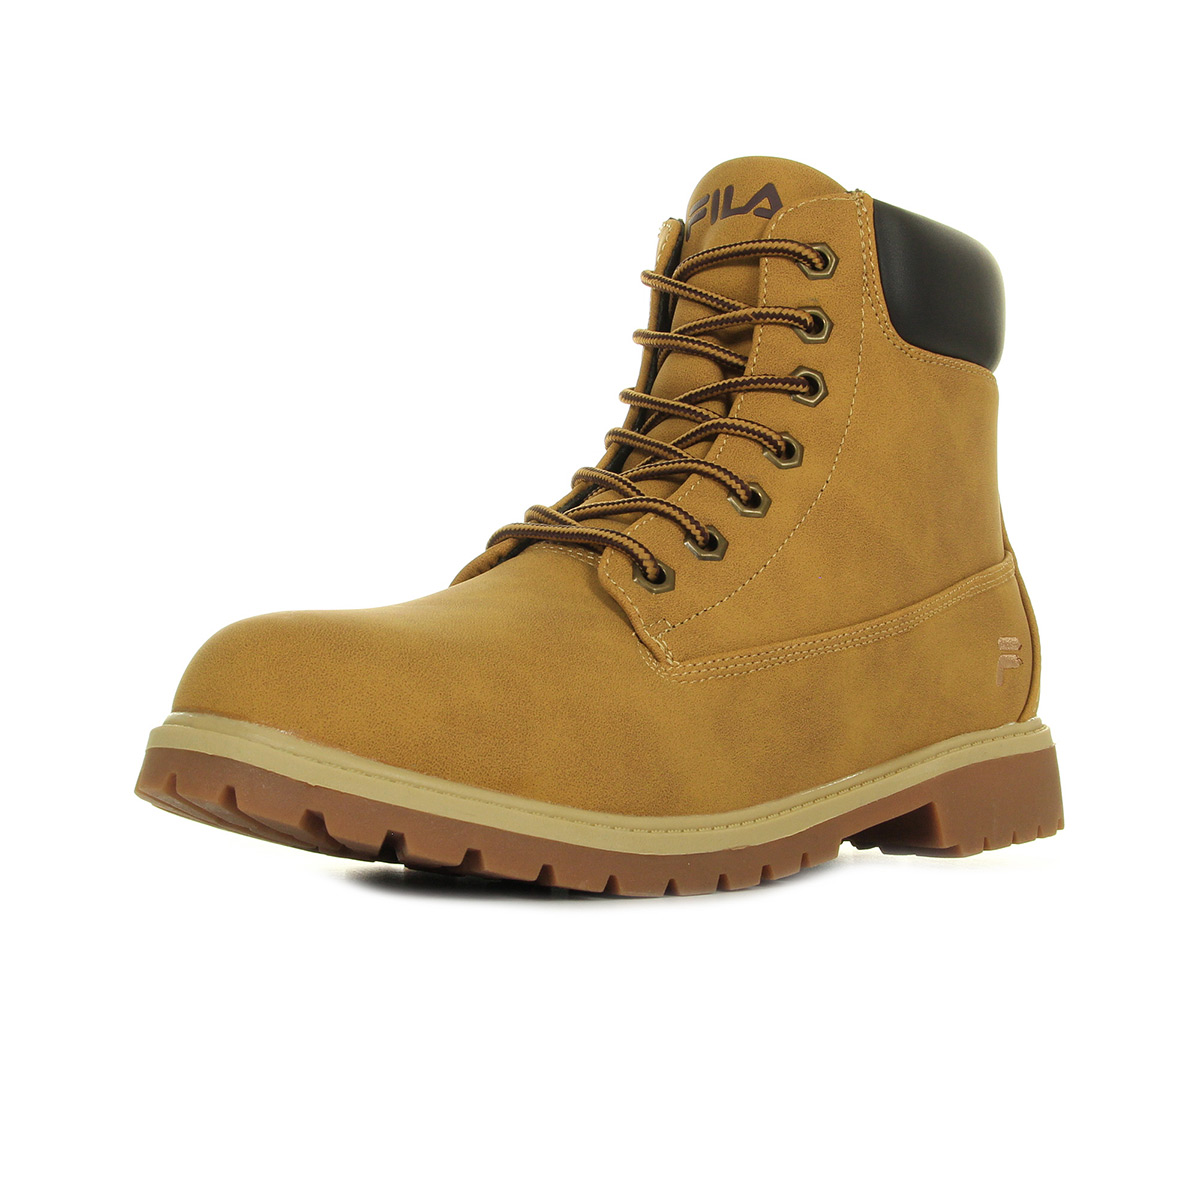 Details zu Schuhe Fila Herren Maverick Mid braun